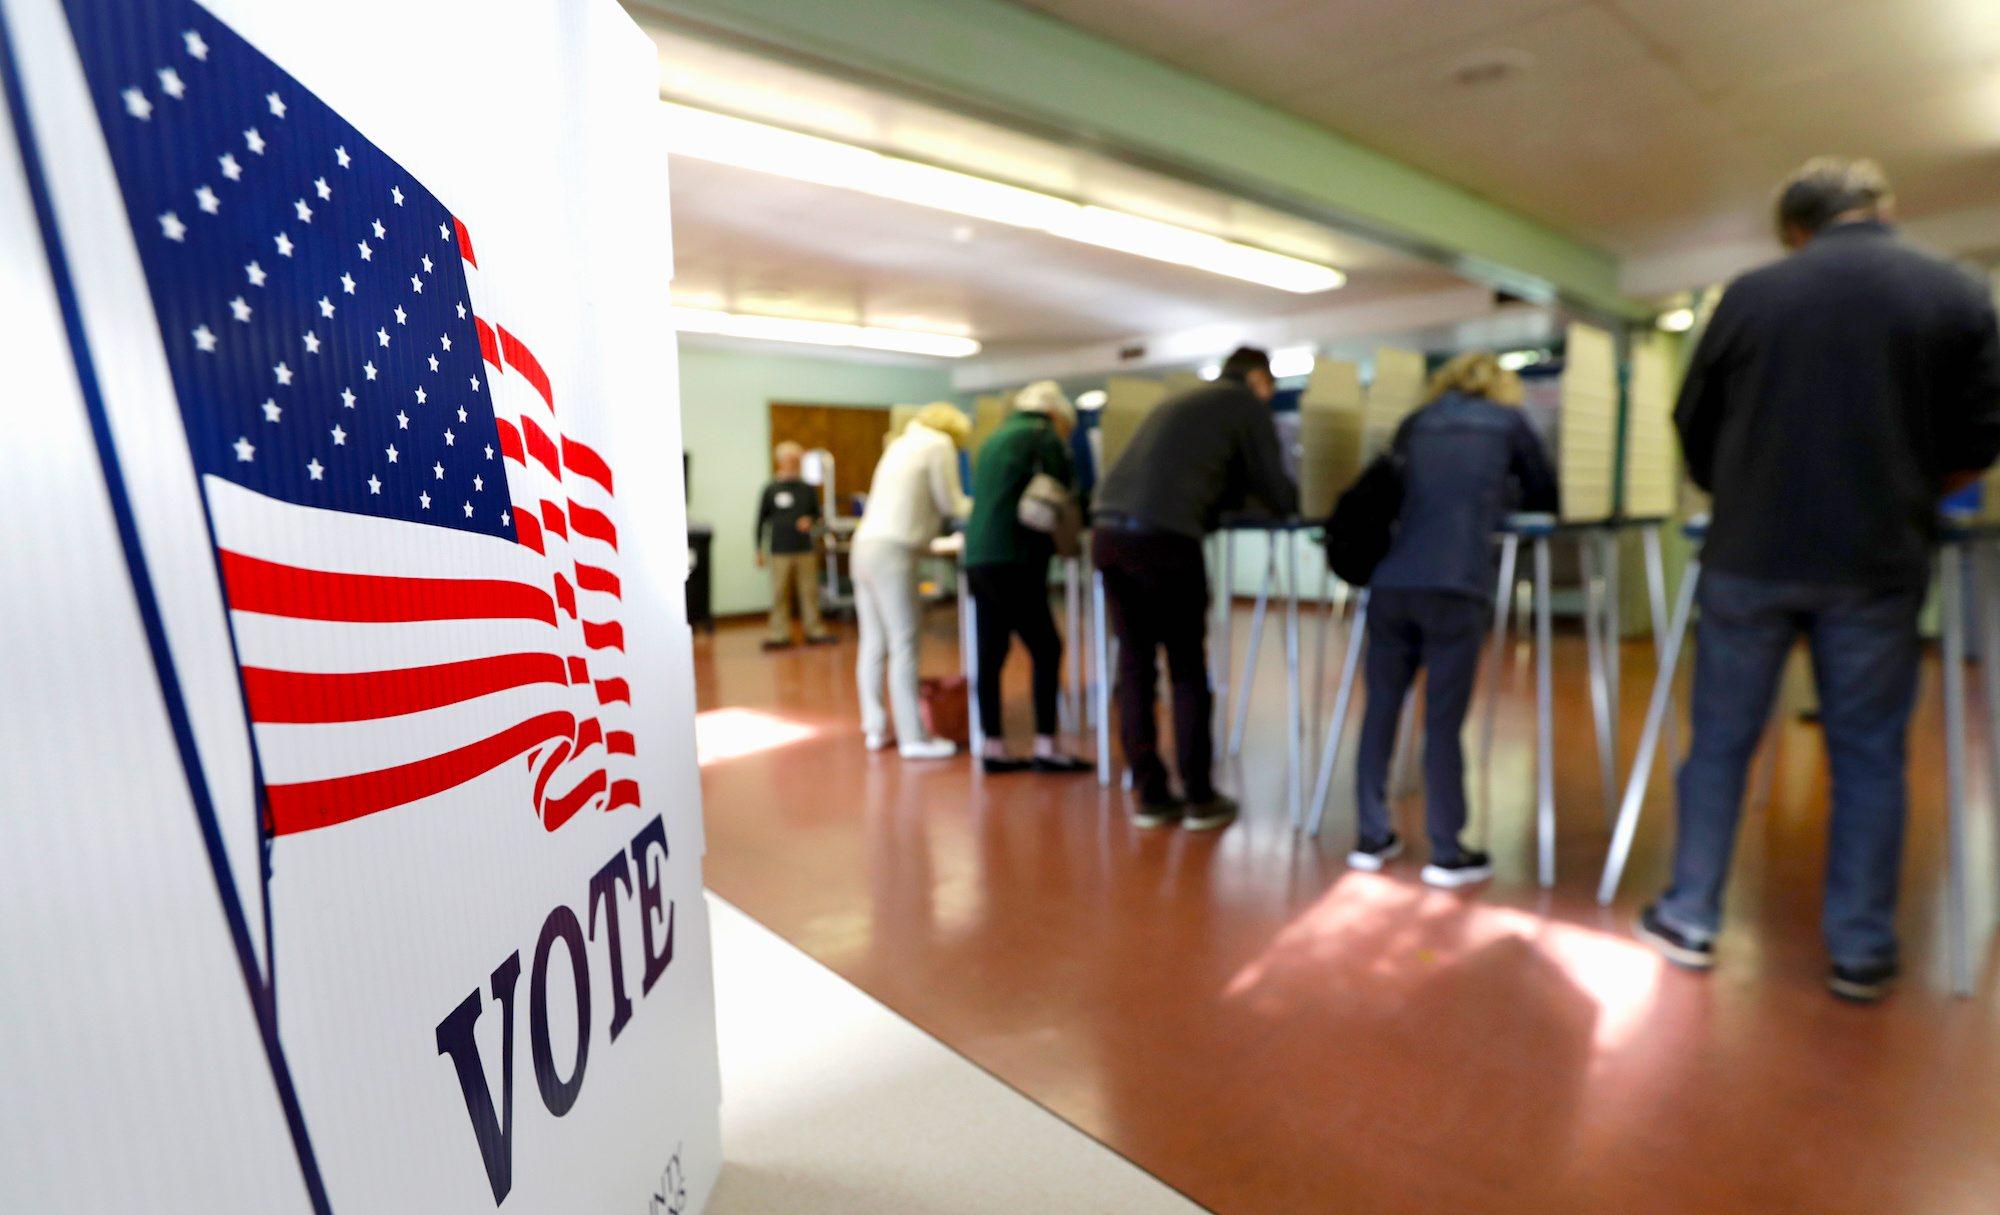 Up 79%: Millennials dominated midterm turnout